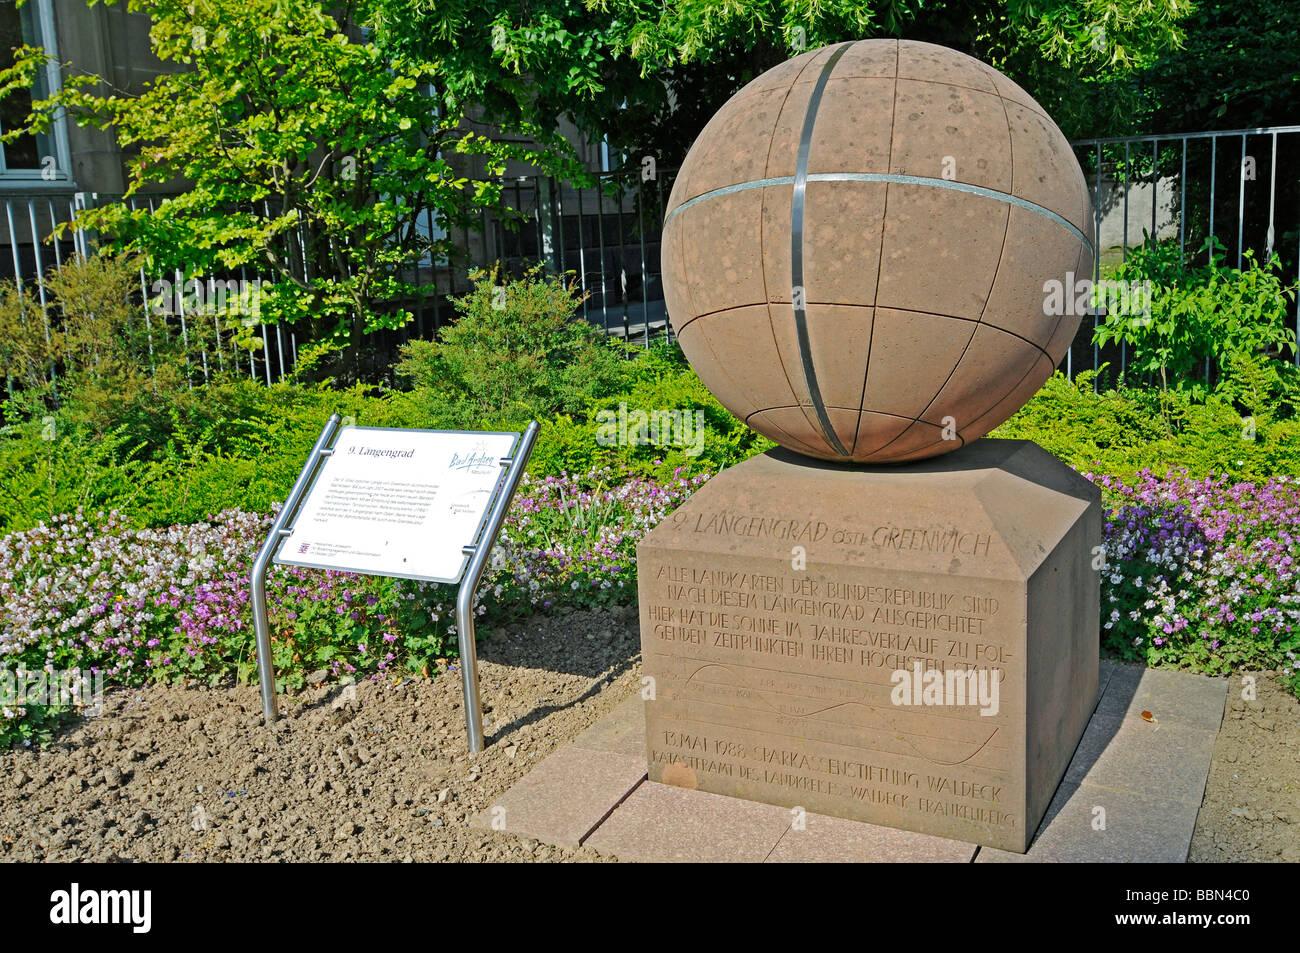 Ninth Longitude, Greenwich, globe, Meridian, marker, monument Meridian, Bad Arolsen, Hesse, Germany, Europe - Stock Image